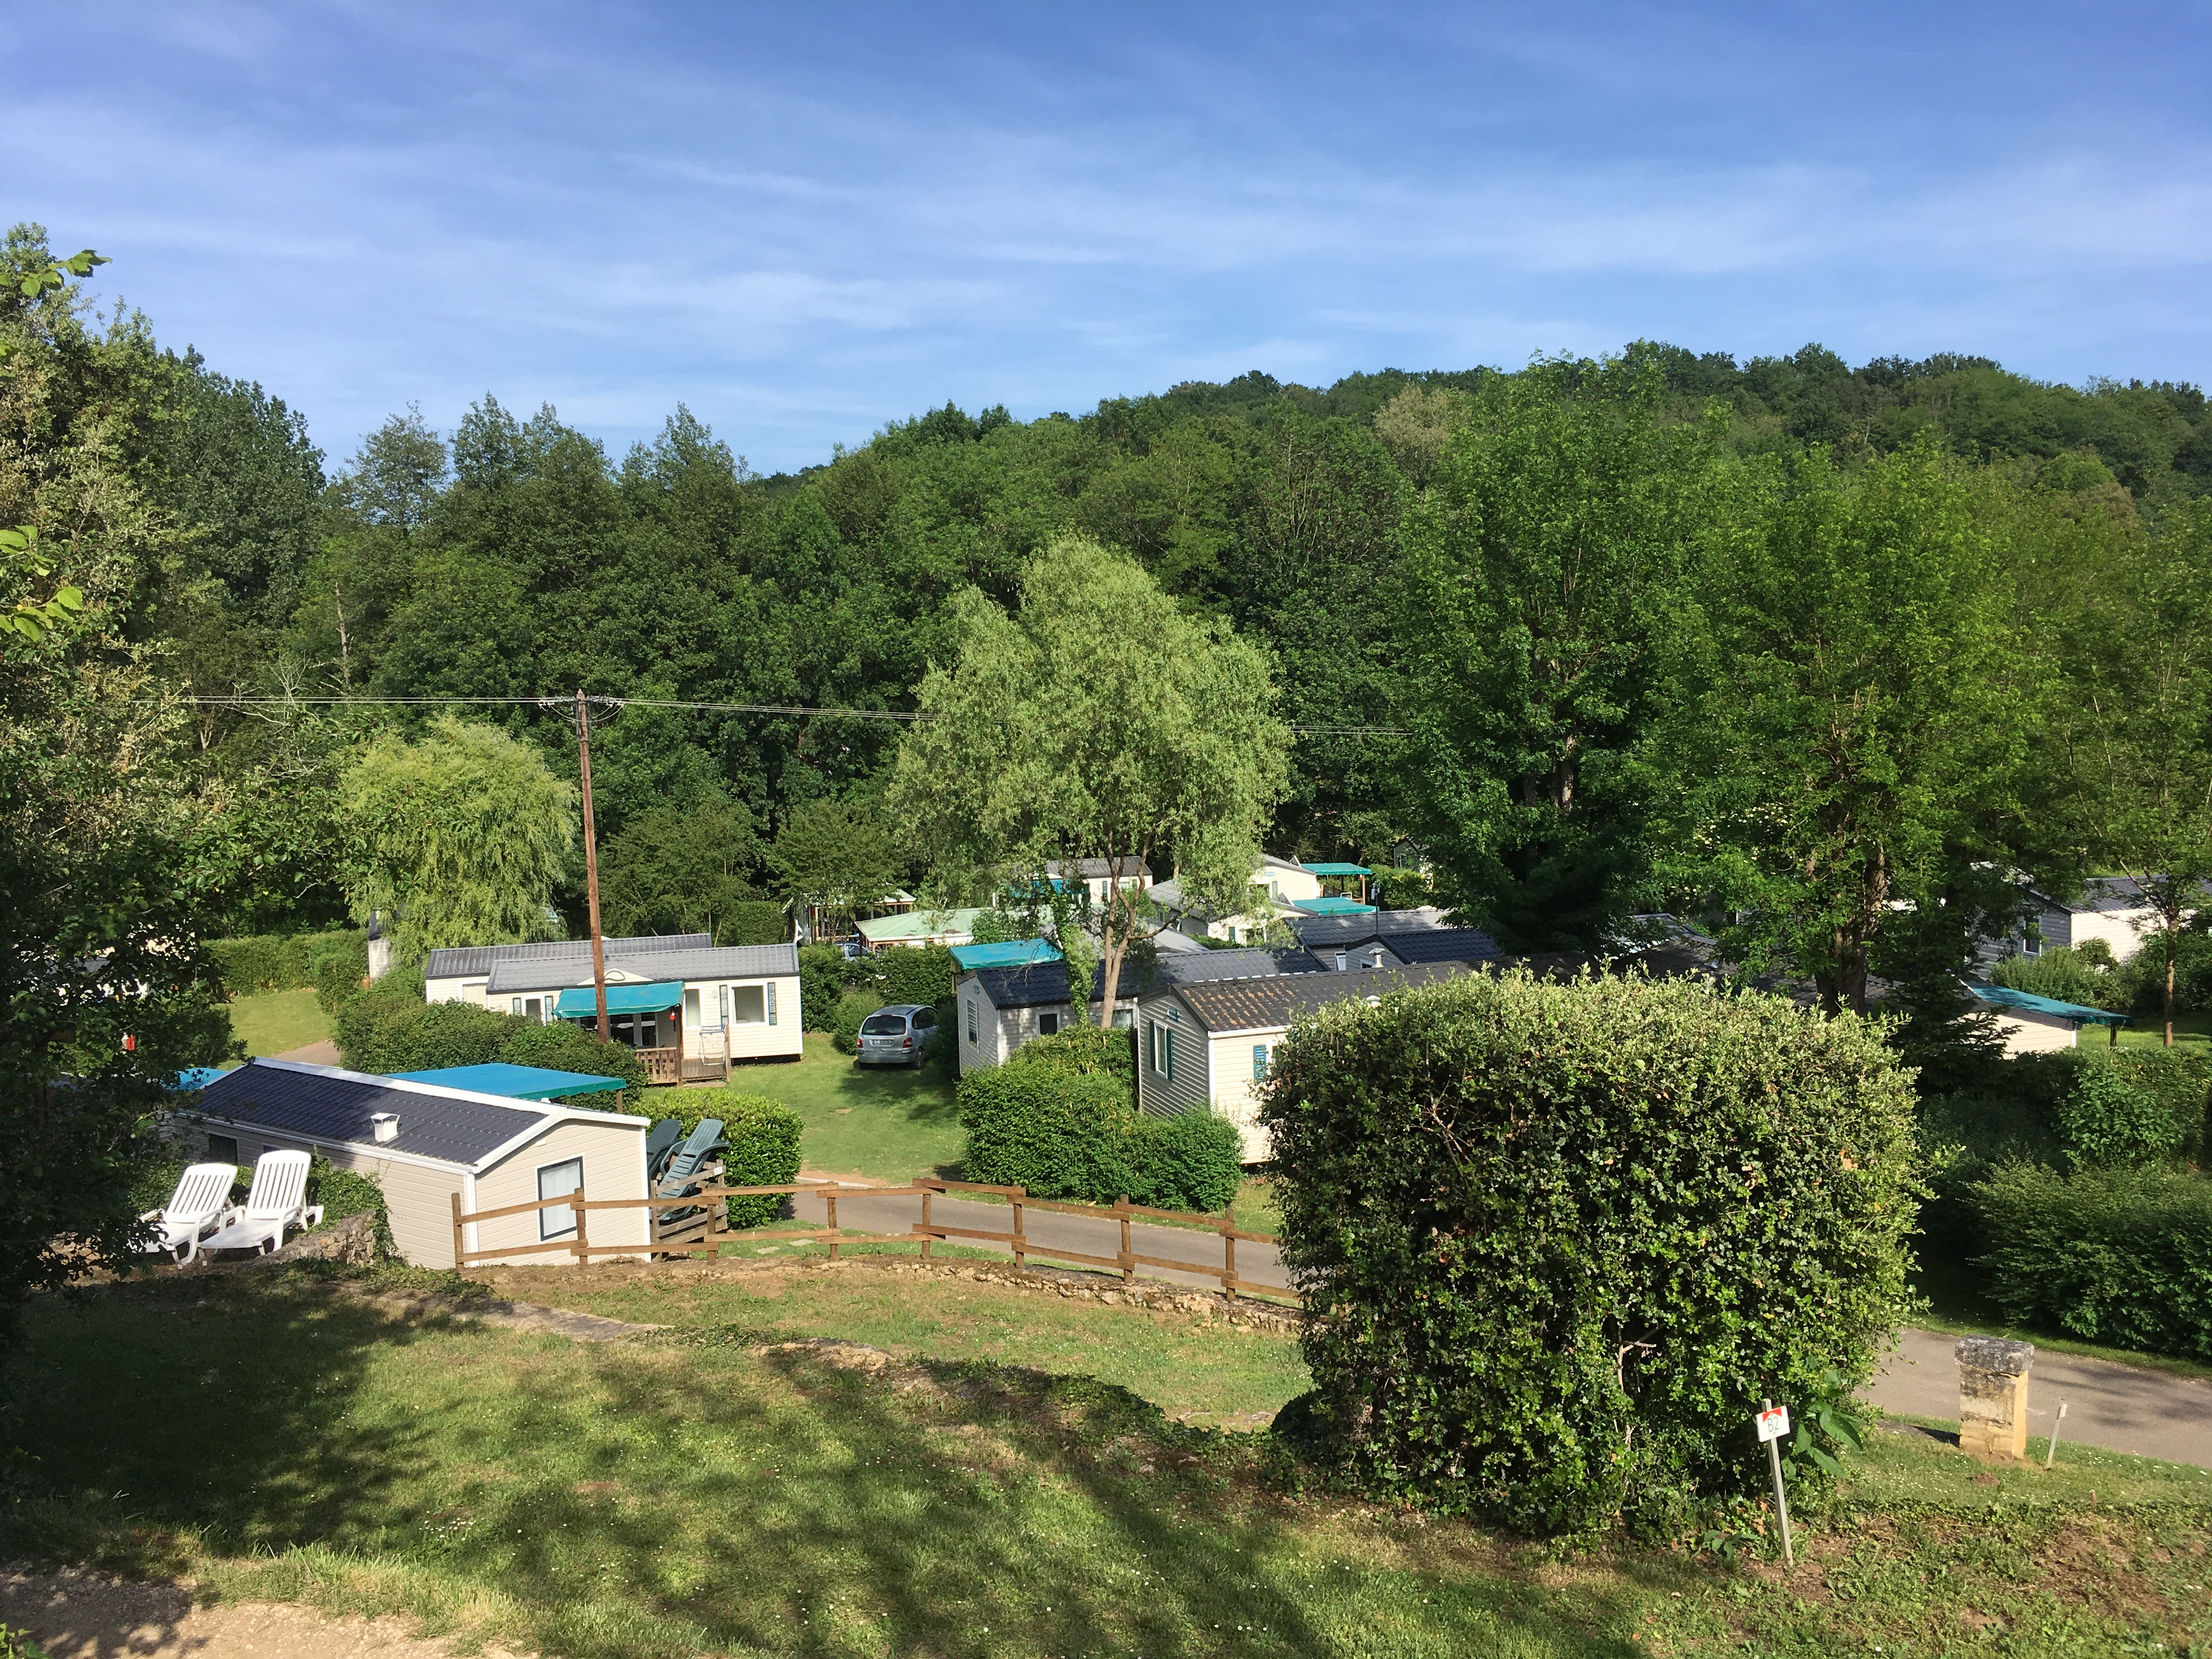 campingvakantie